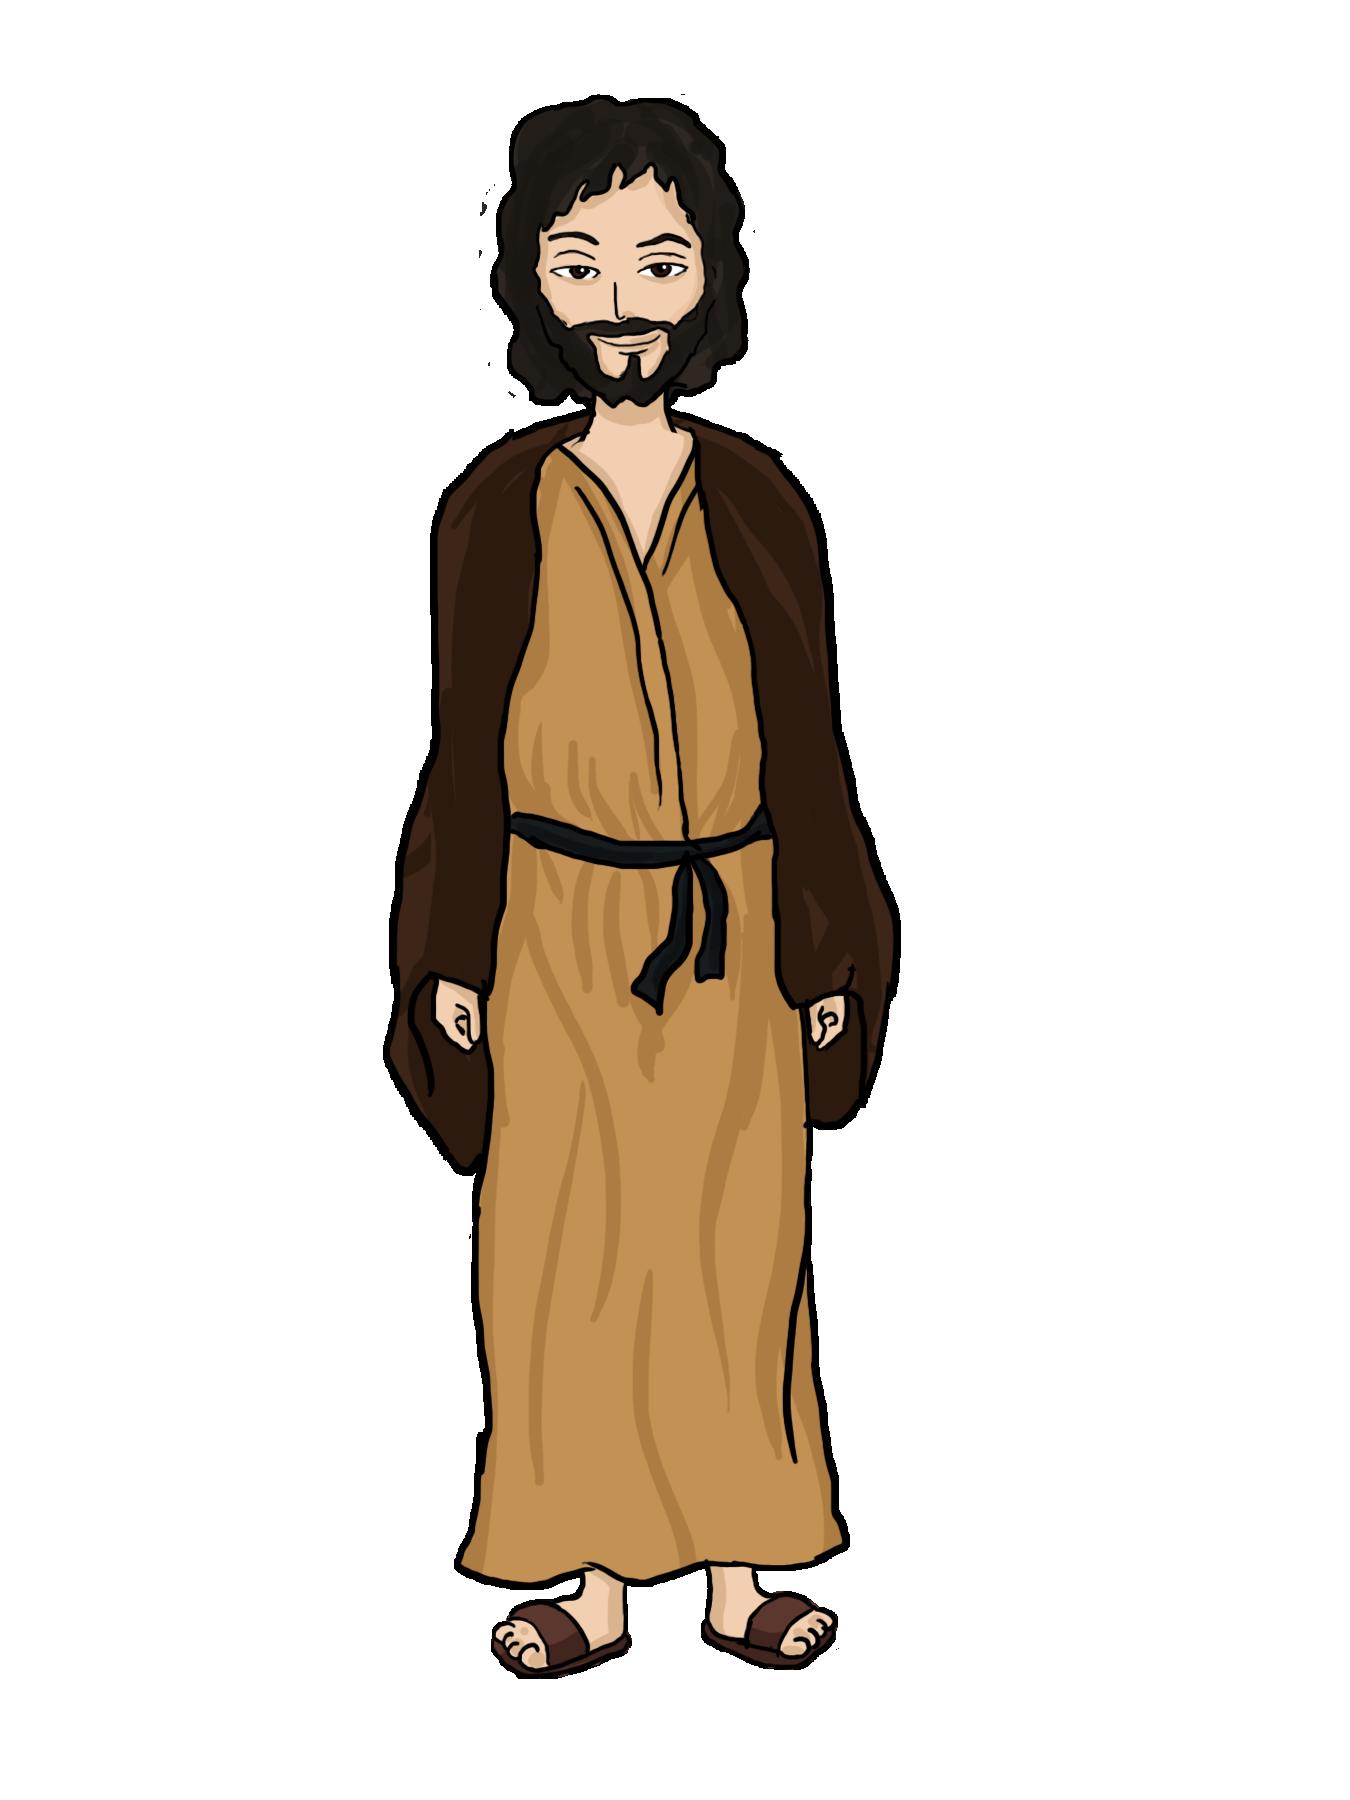 Jesus christ png image. Rabbi clipart animated